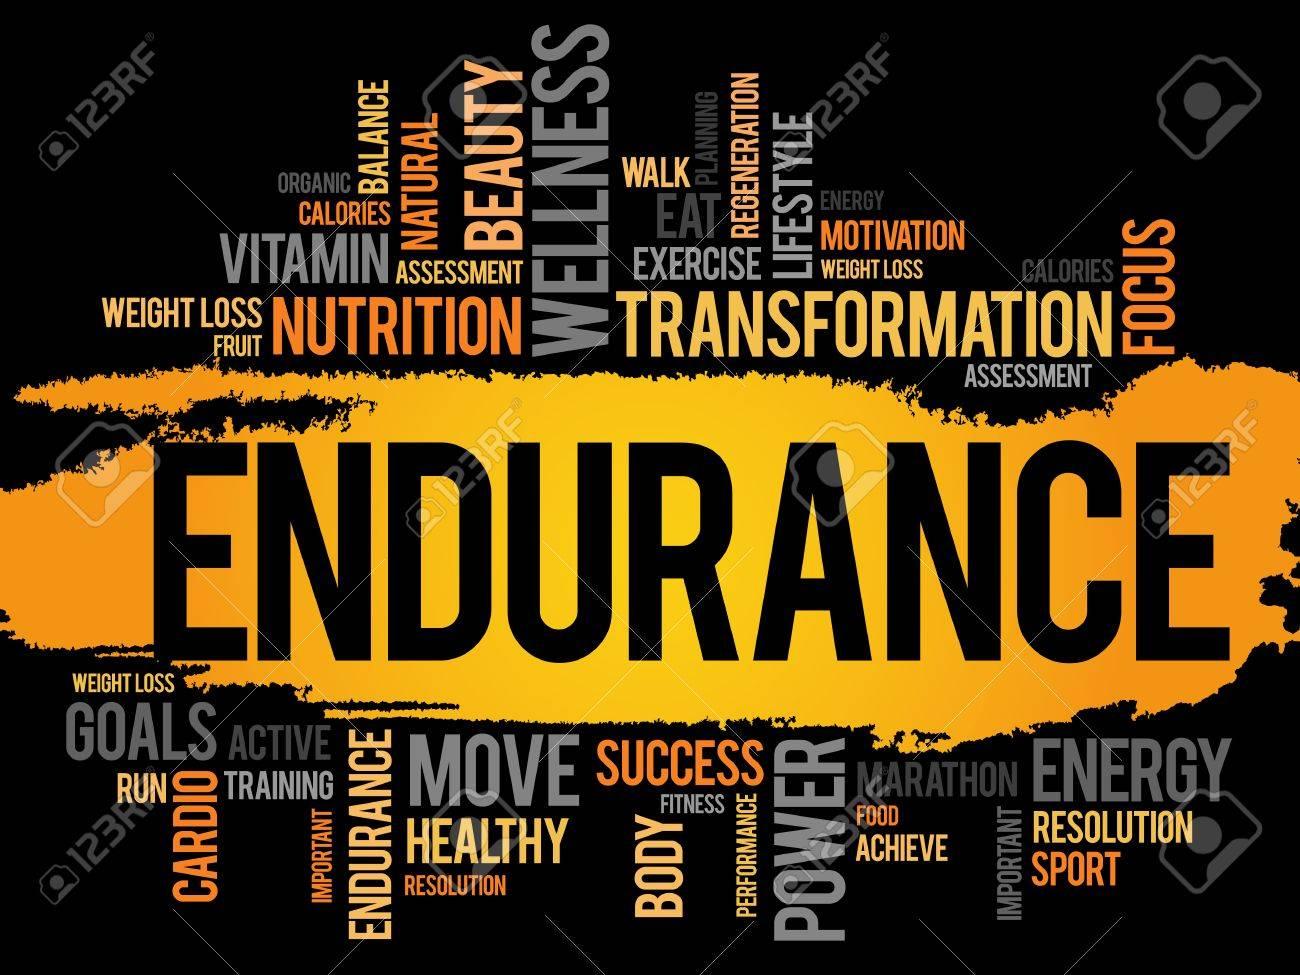 ENDURANCE word cloud, fitness, sport, health concept - 52334366